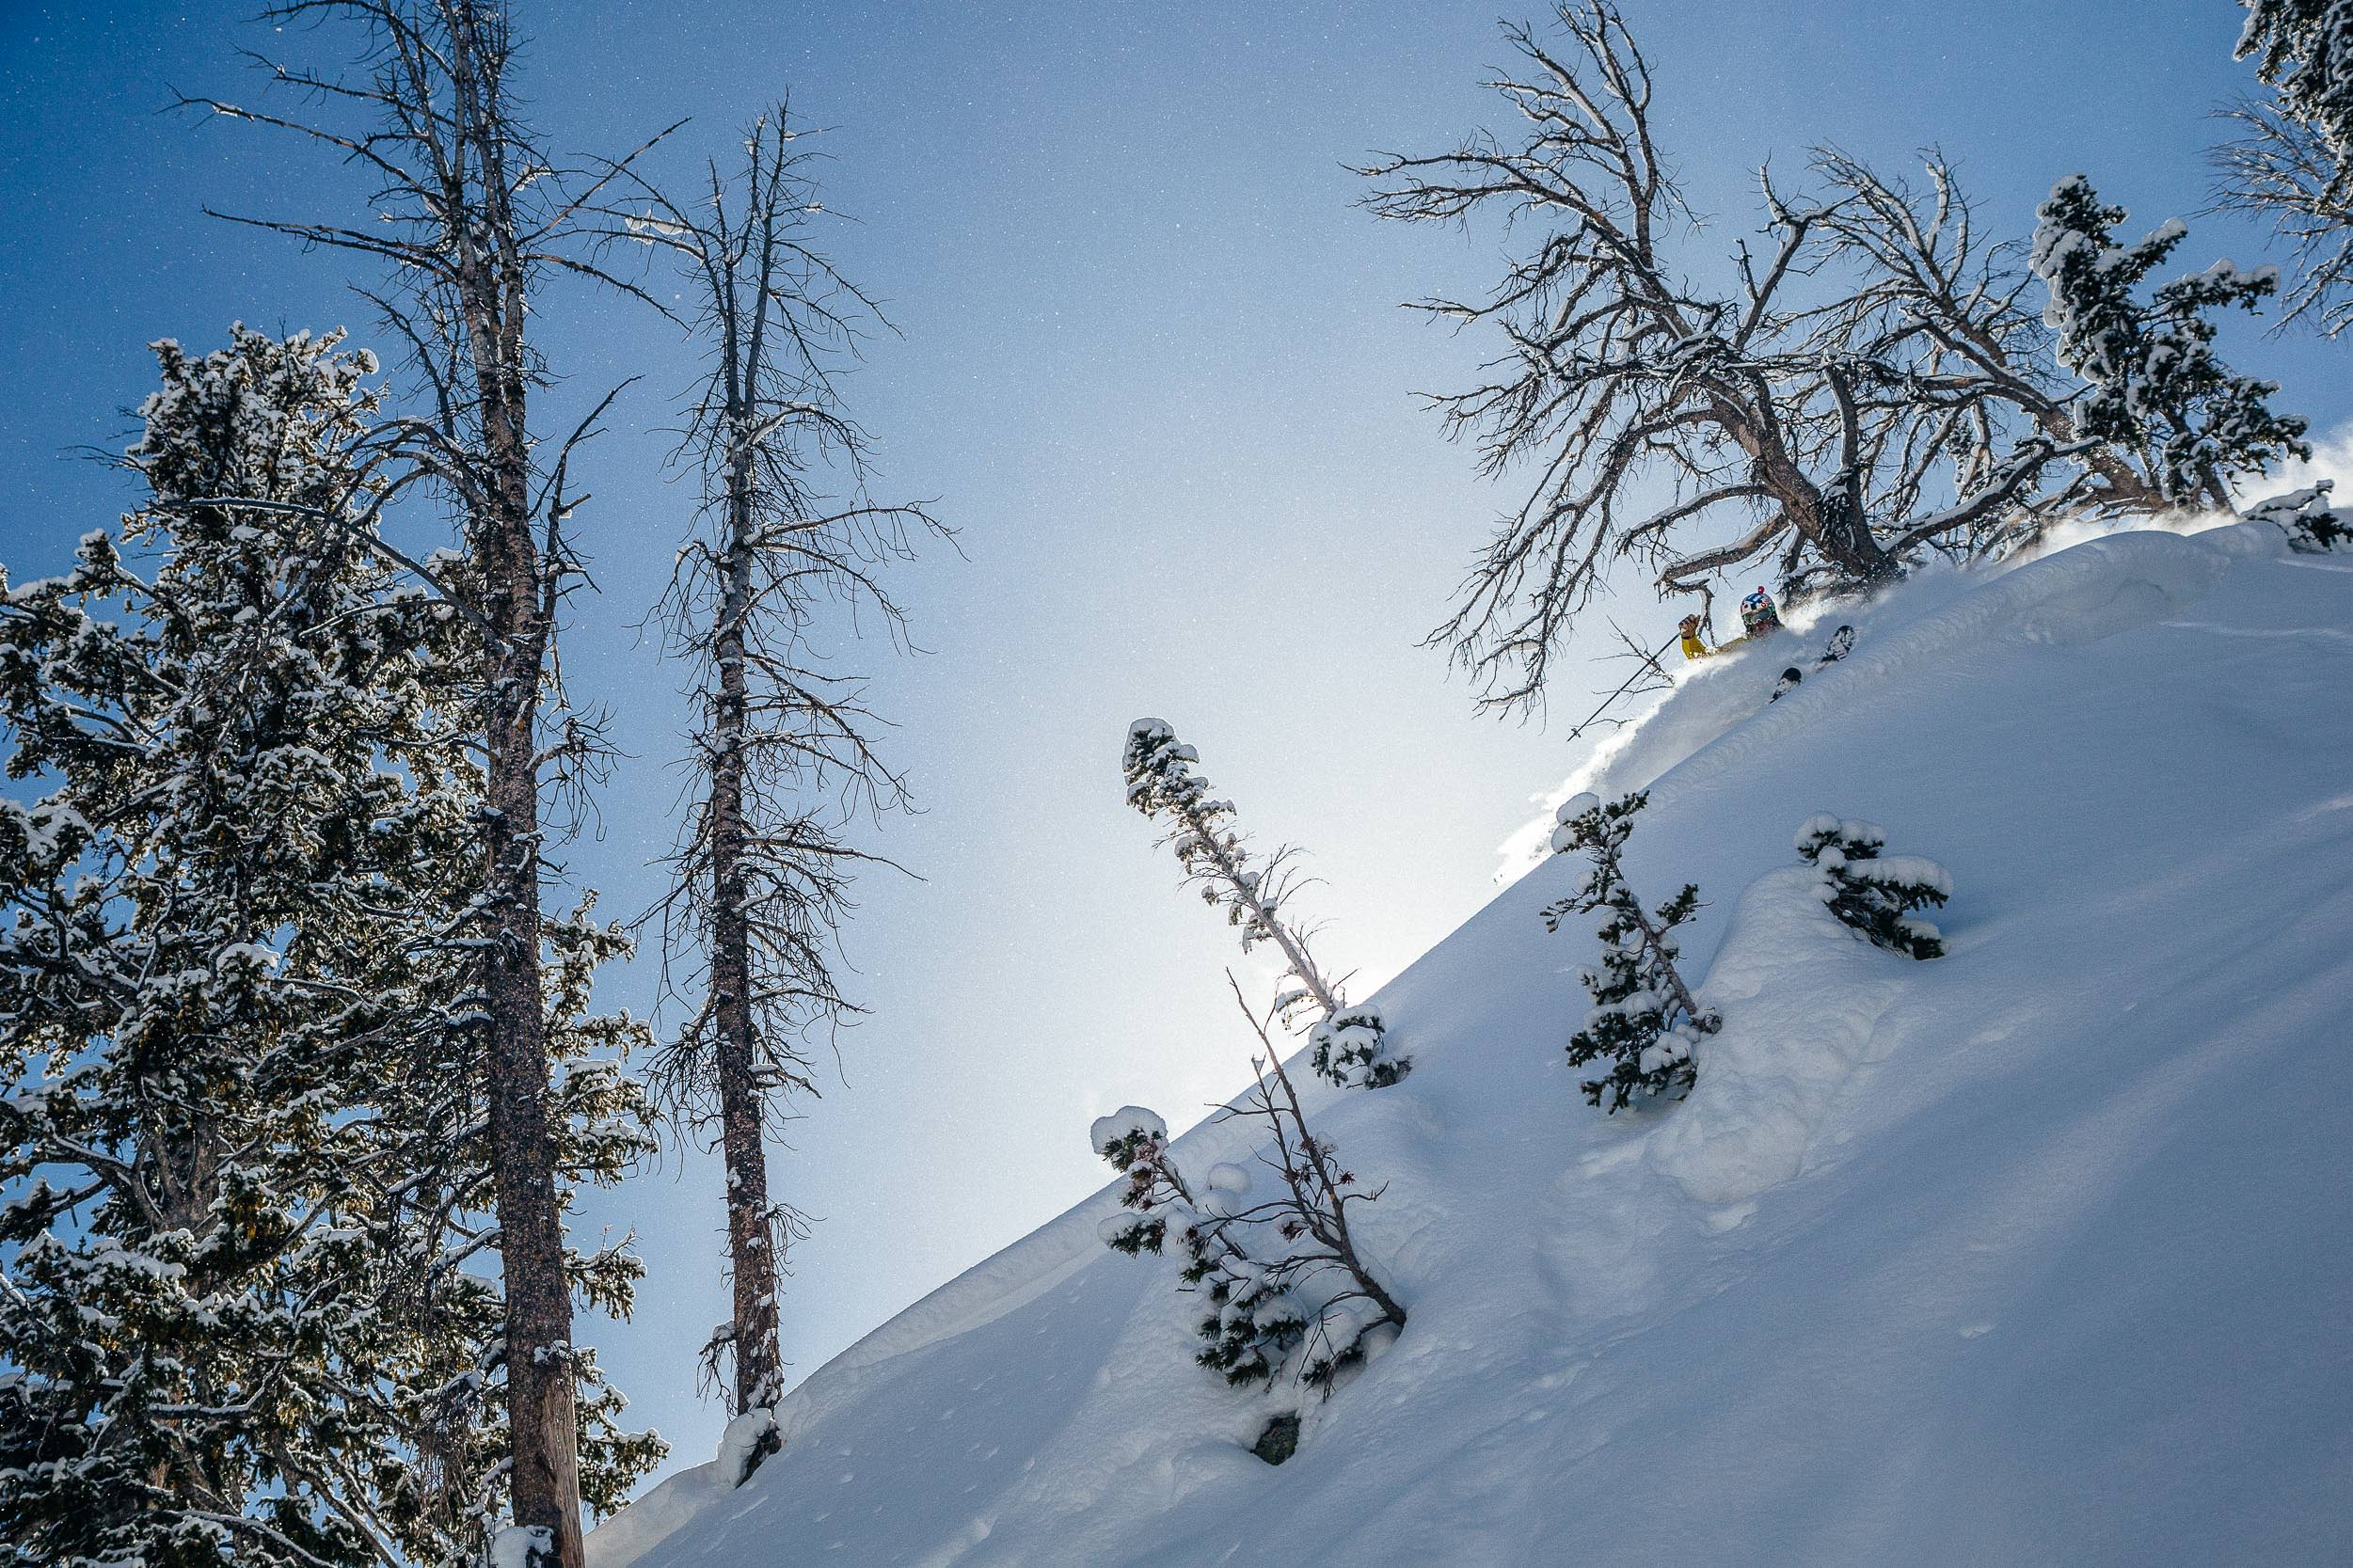 Jackson Hole Mountain Resort | Instagram Takeover